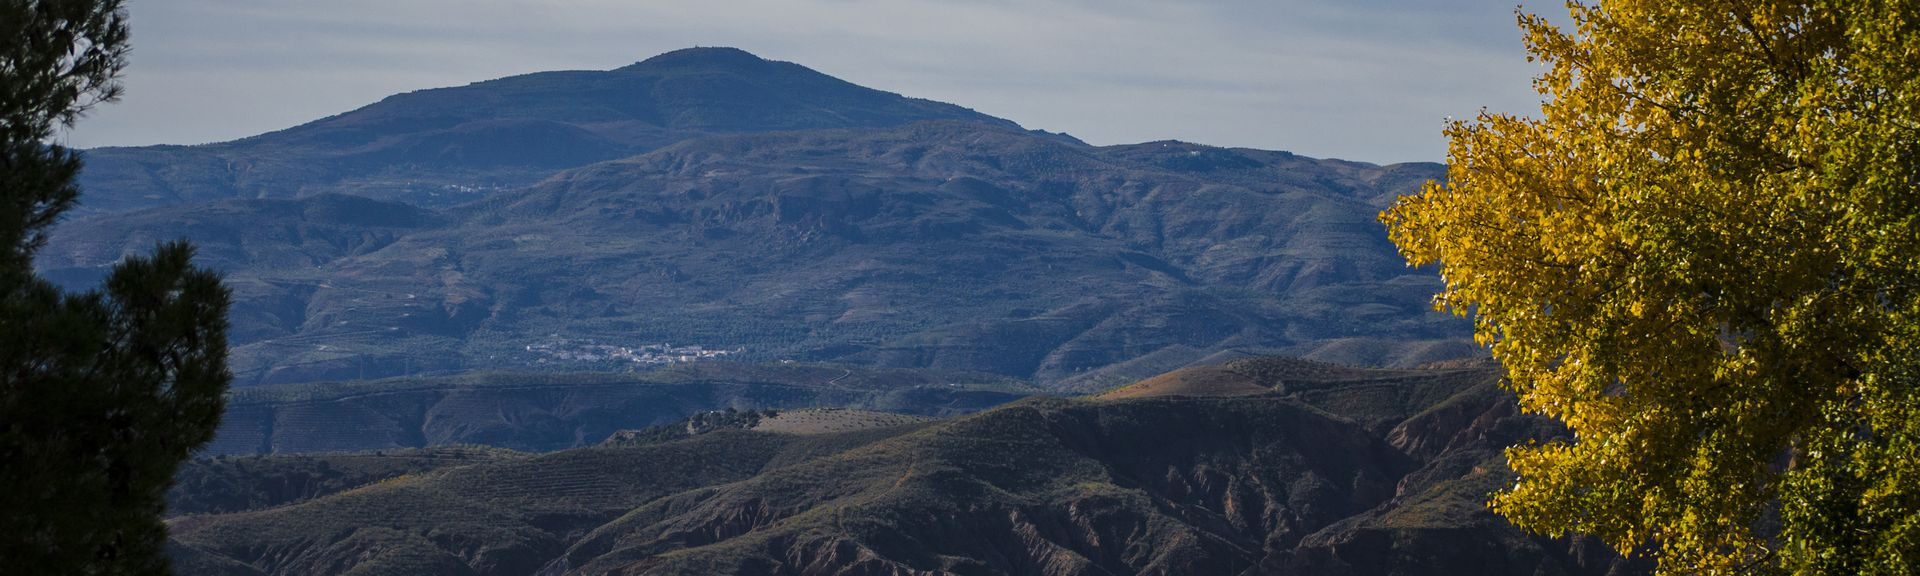 Berchules, Andalusia, Spain